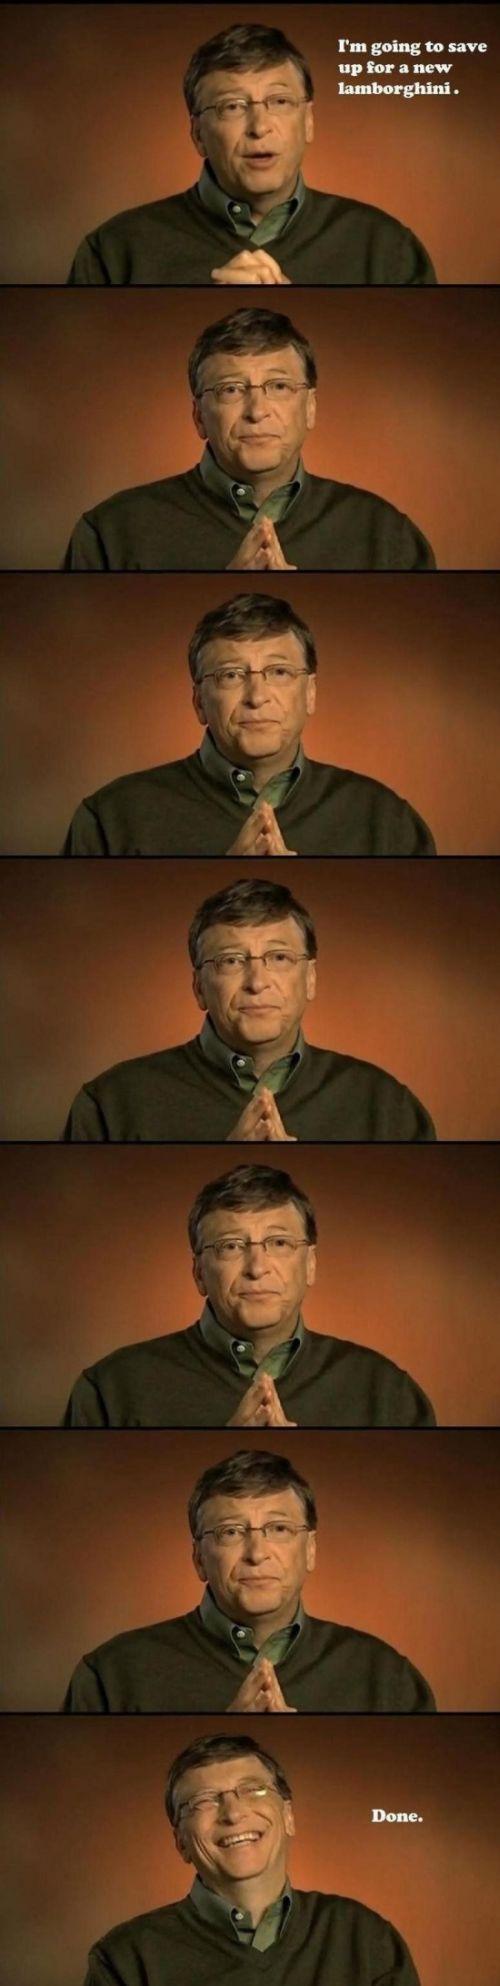 Humor: Bill Gates ahorra para un nuevo lamborghini